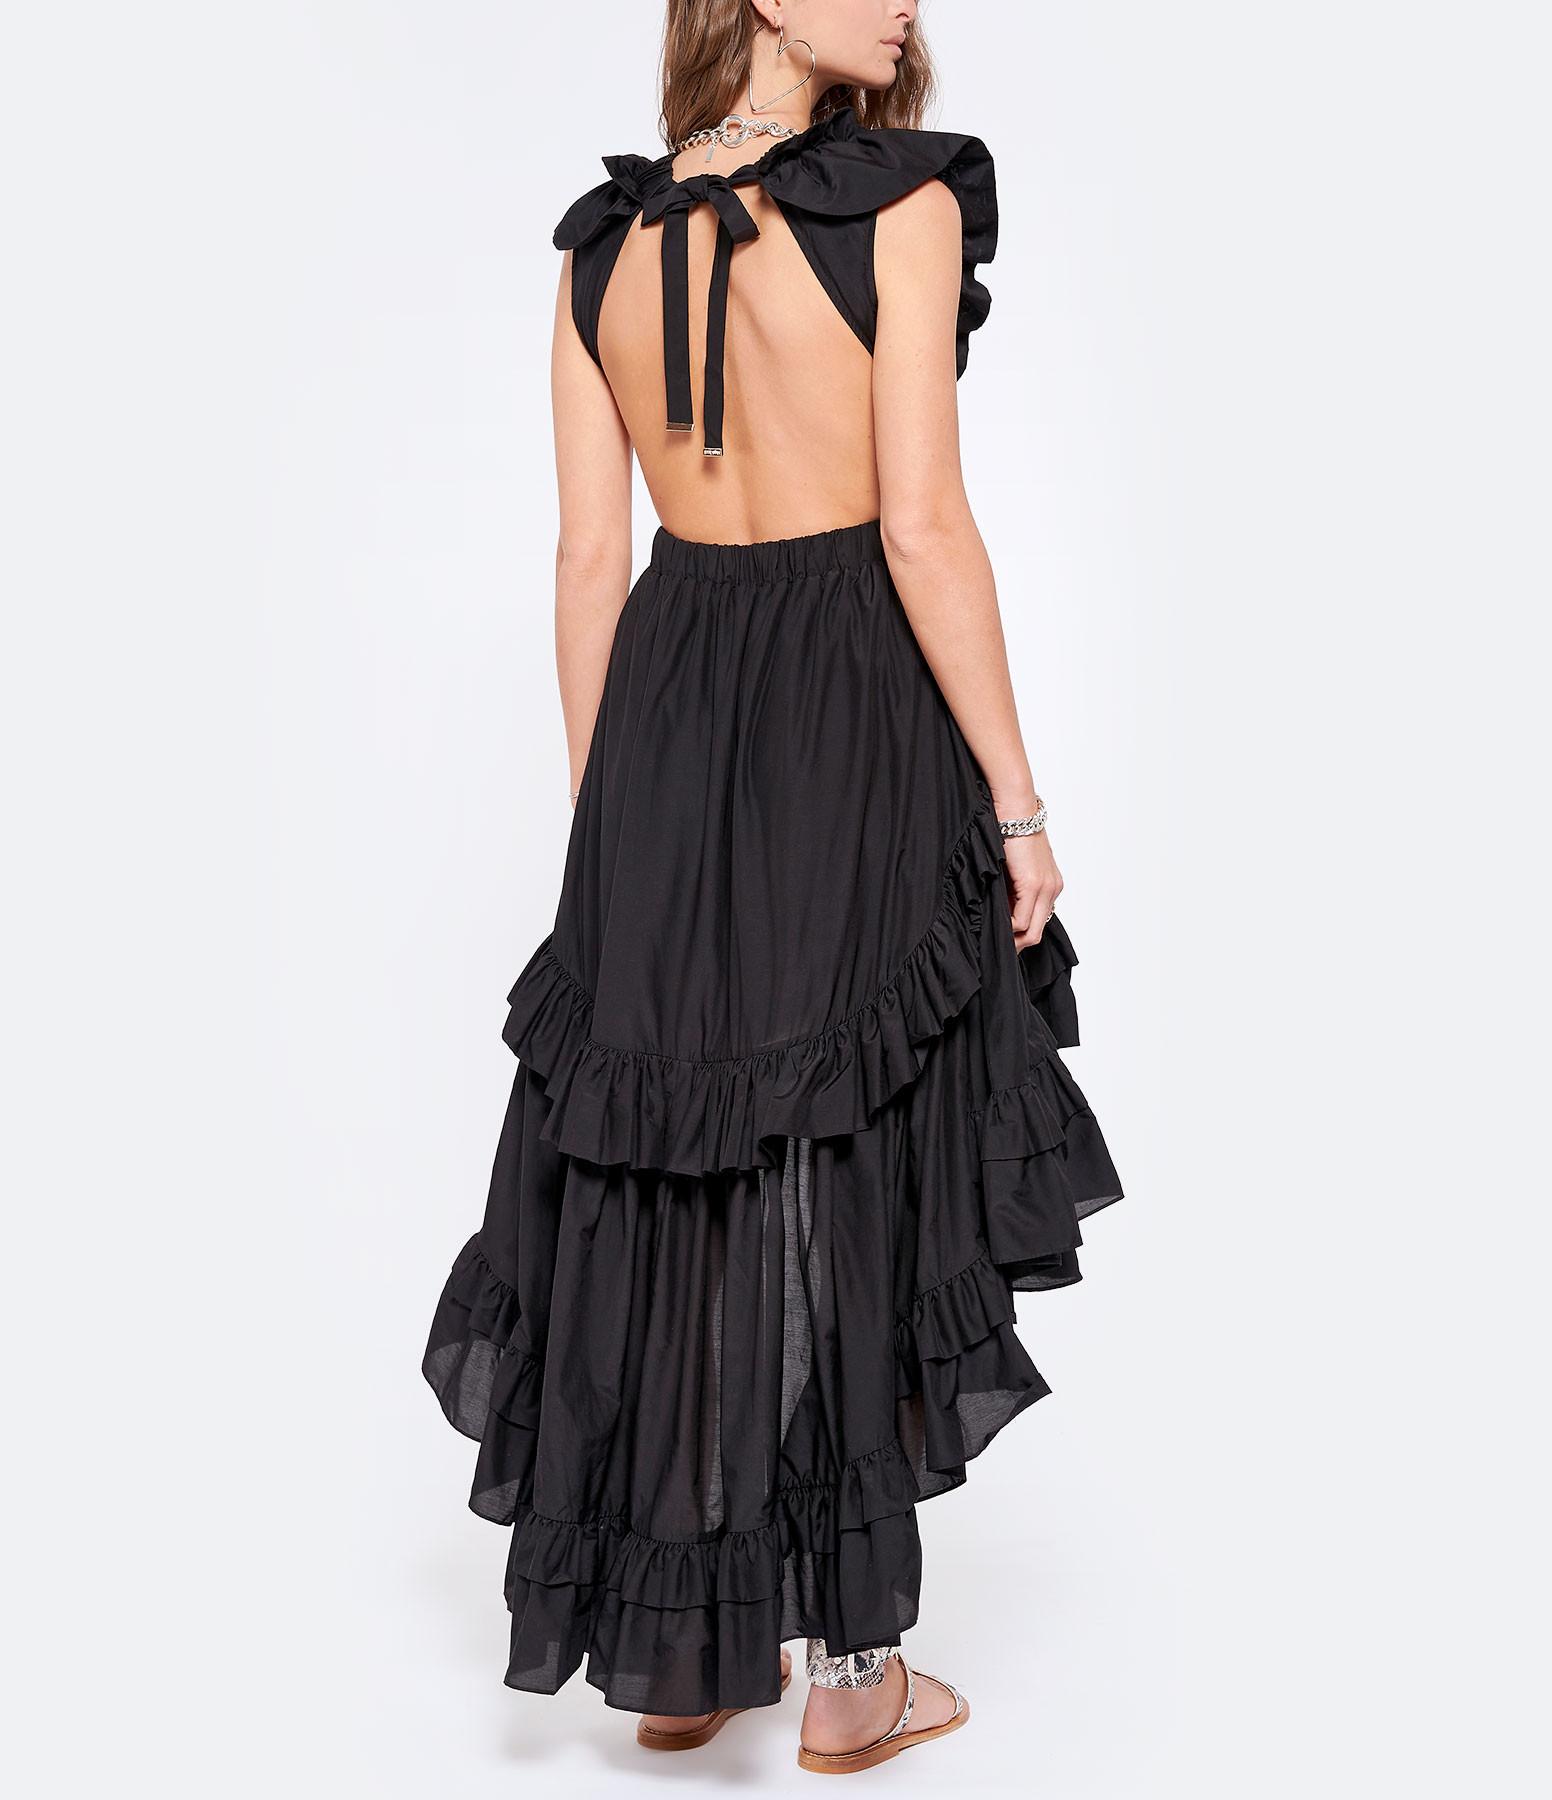 MAGALI PASCAL - Robe Botanic Soie Coton Noir